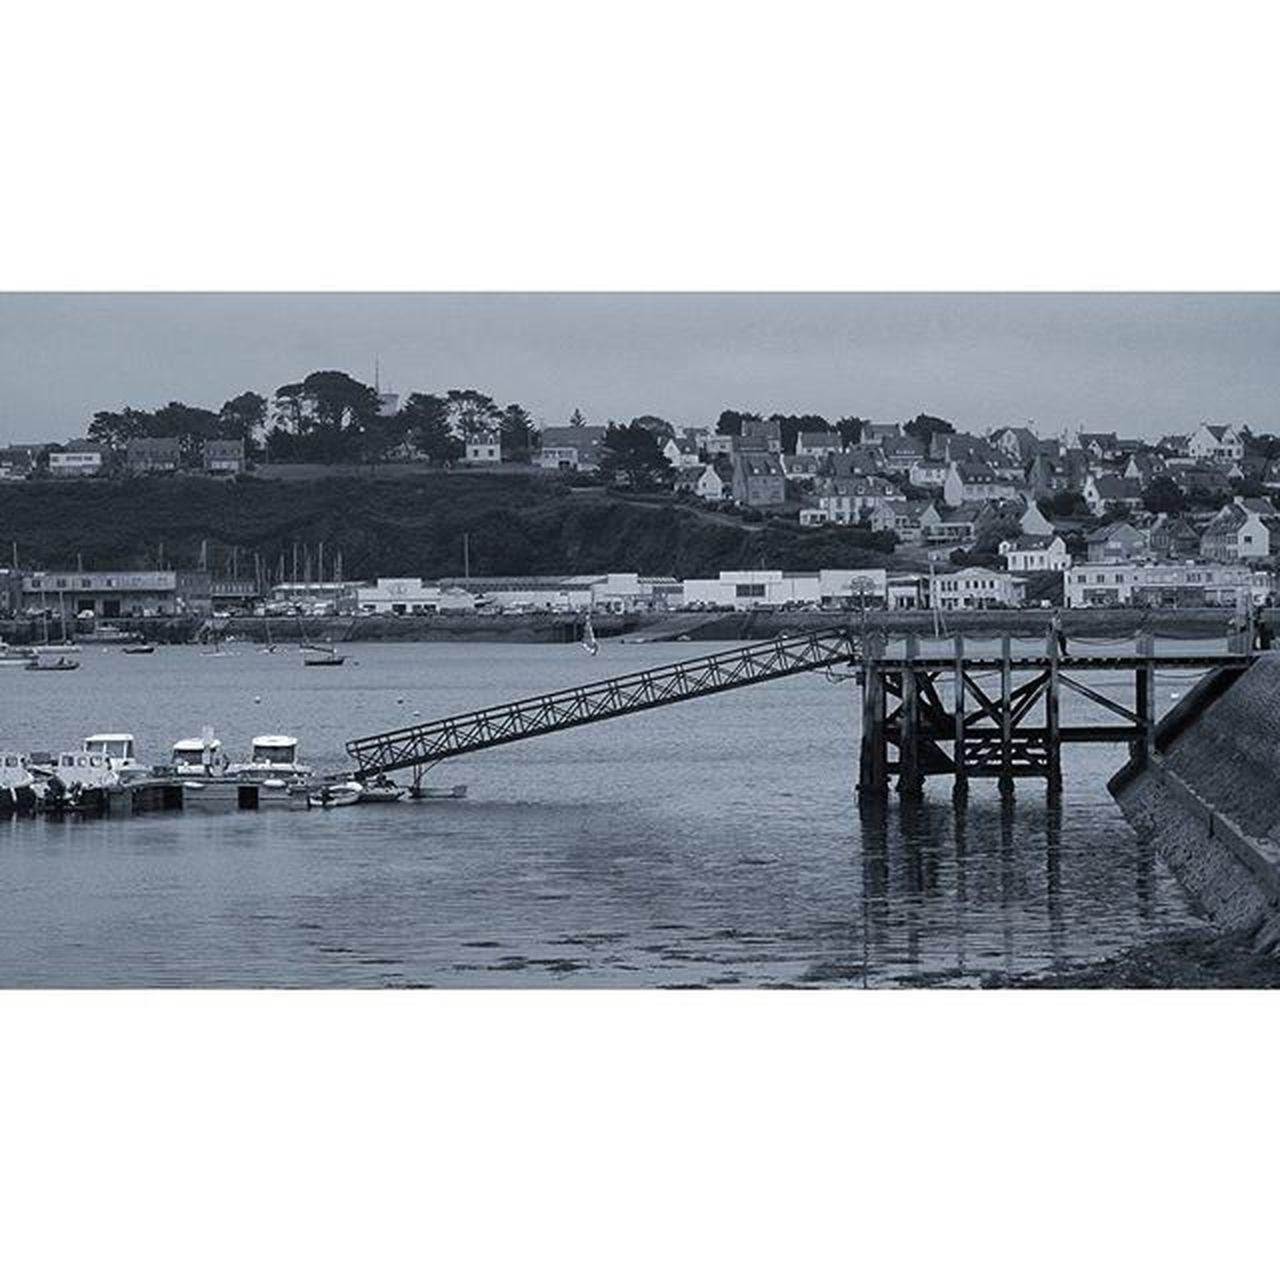 Camaret-sur-mer Camaretsurmer Port Bretagnetourisme Bretagne noiretblanc finistere igersbretagne igersfinistere grainedenature